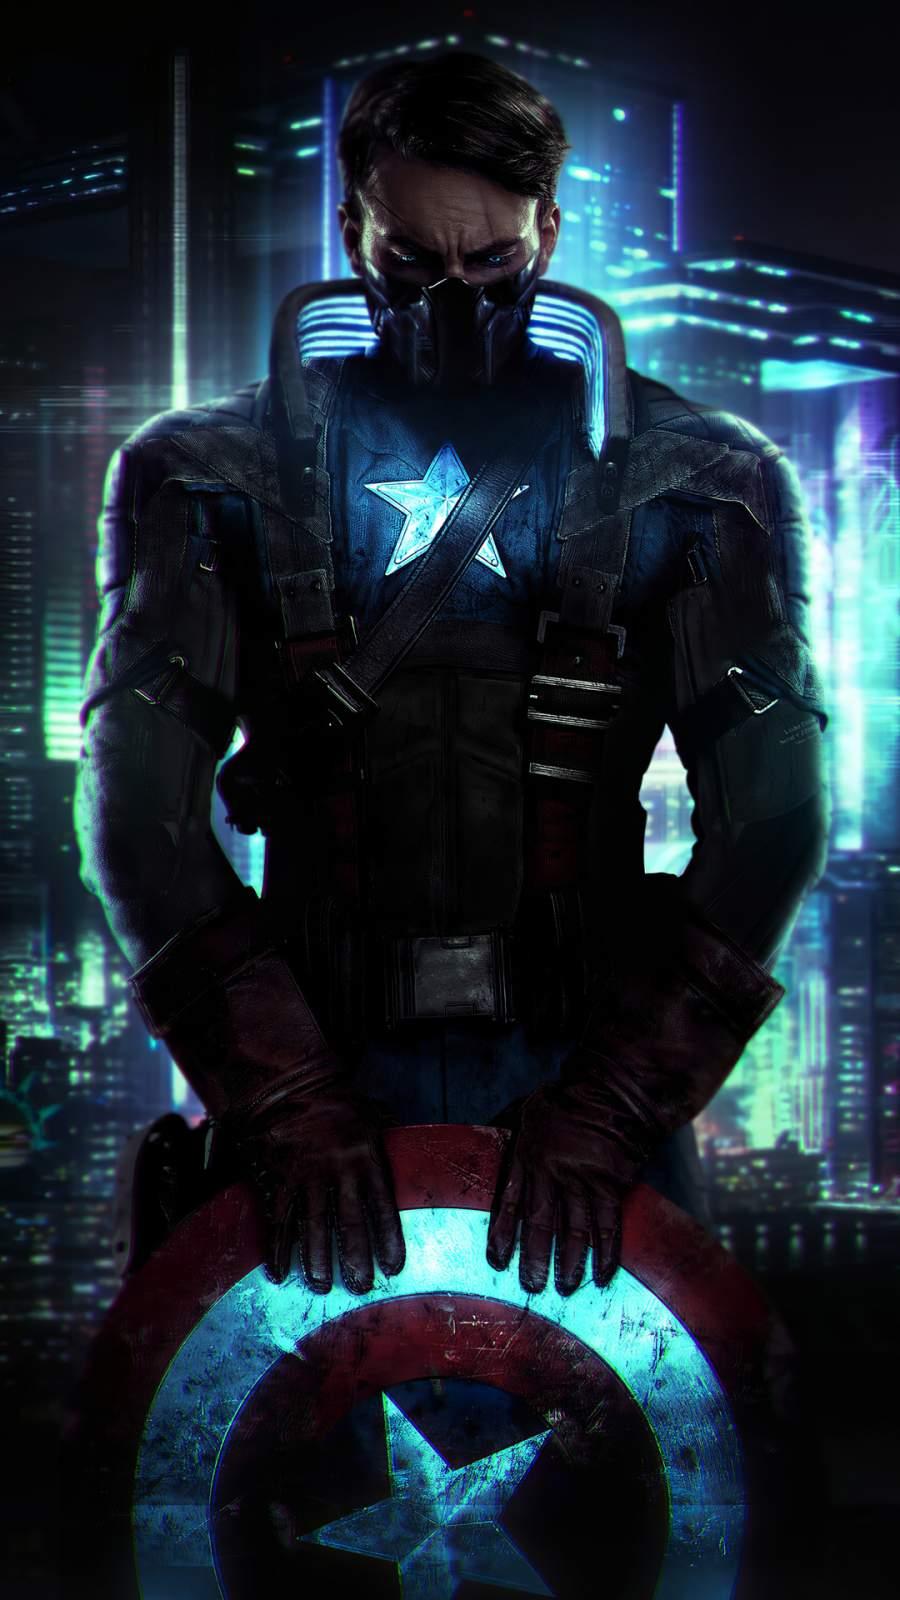 Captain America Cyberpunk iPhone Wallpaper